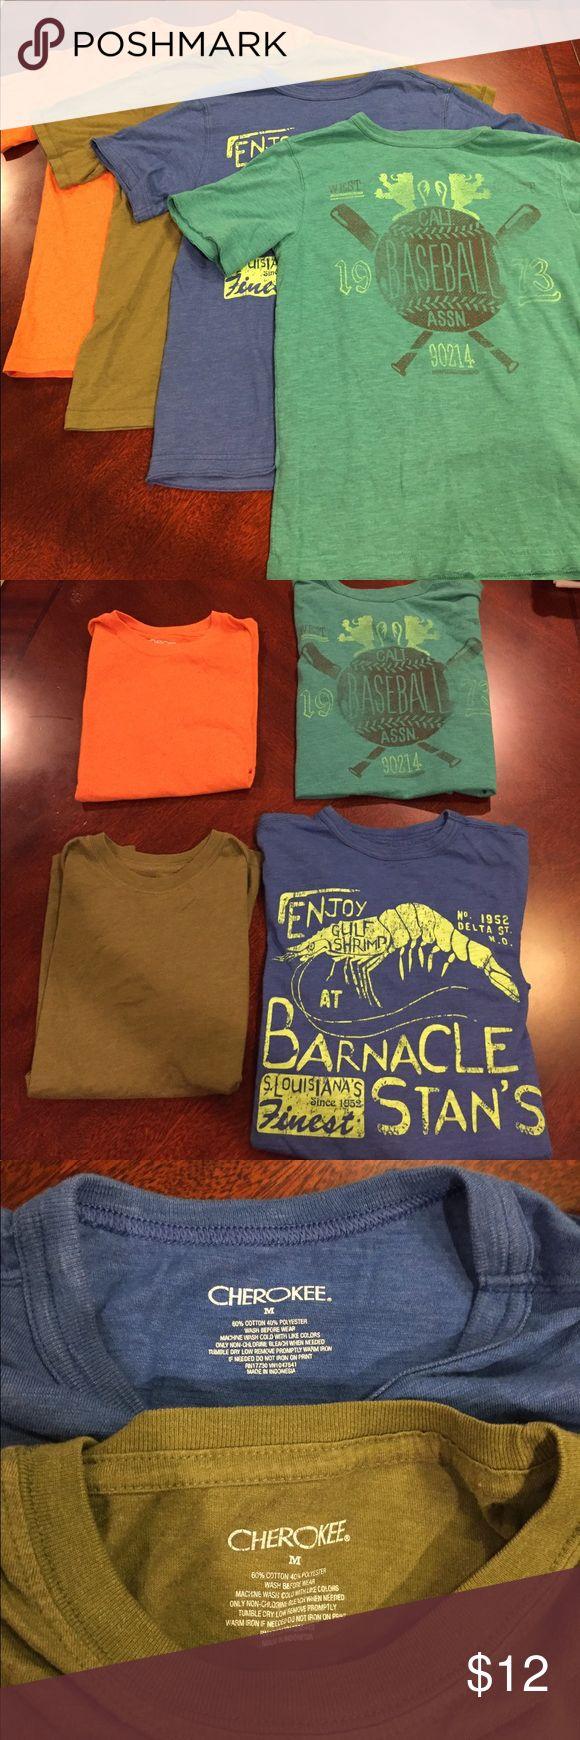 4pc boys Cherokee brand t-shirts 4 Cherokee t shirts all size M (8/10) Cherokee Shirts & Tops Tees - Short Sleeve